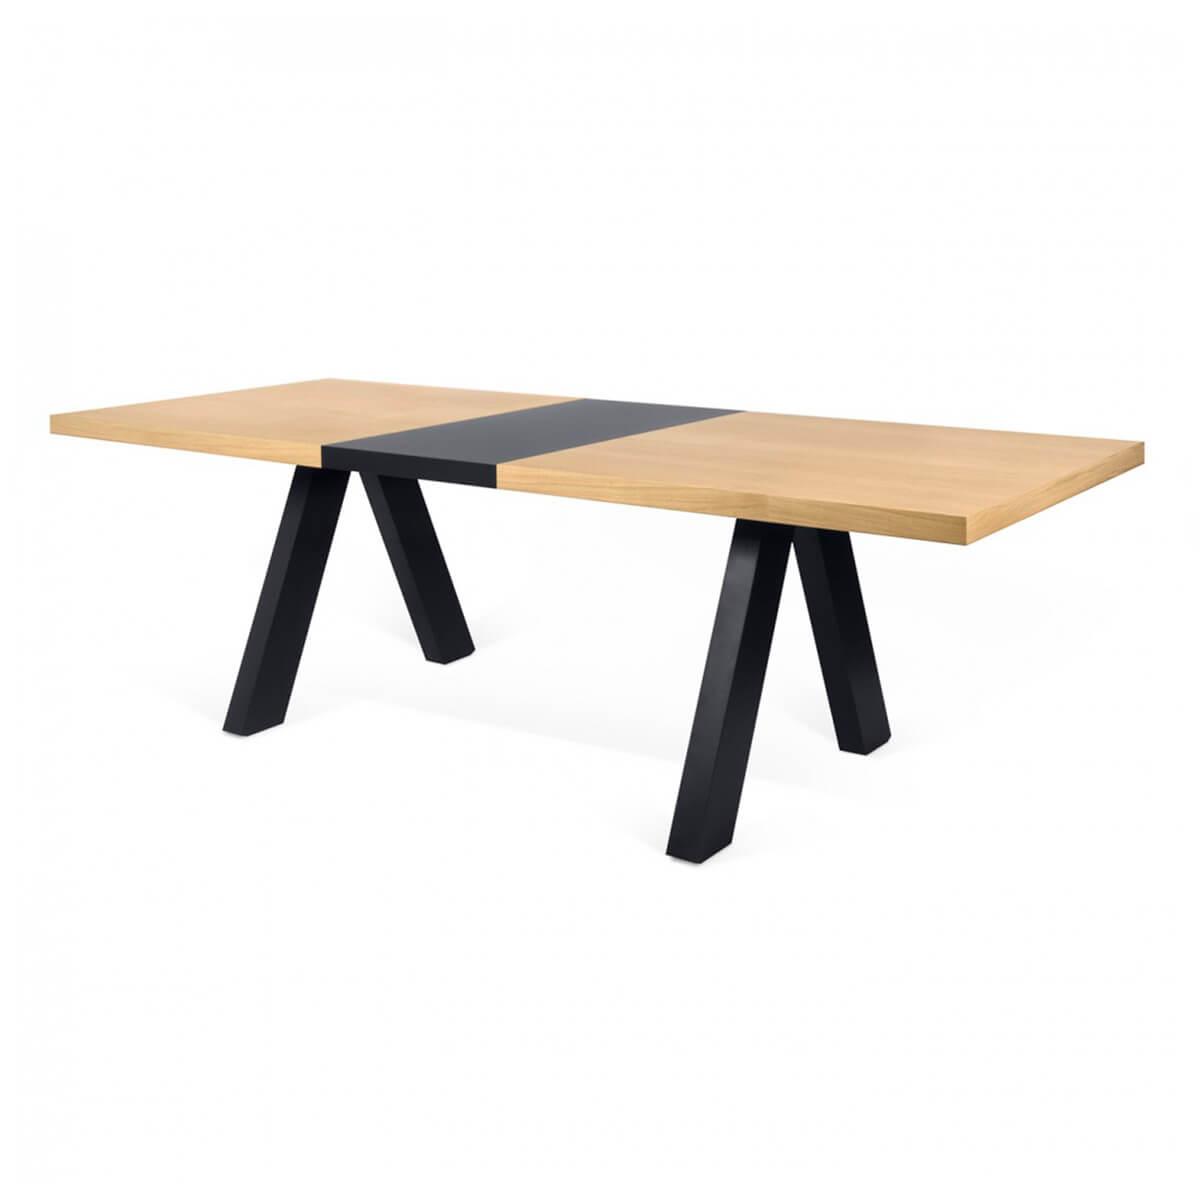 Mesa de comedor extensible de roble. MAXIMUS - Artikalia